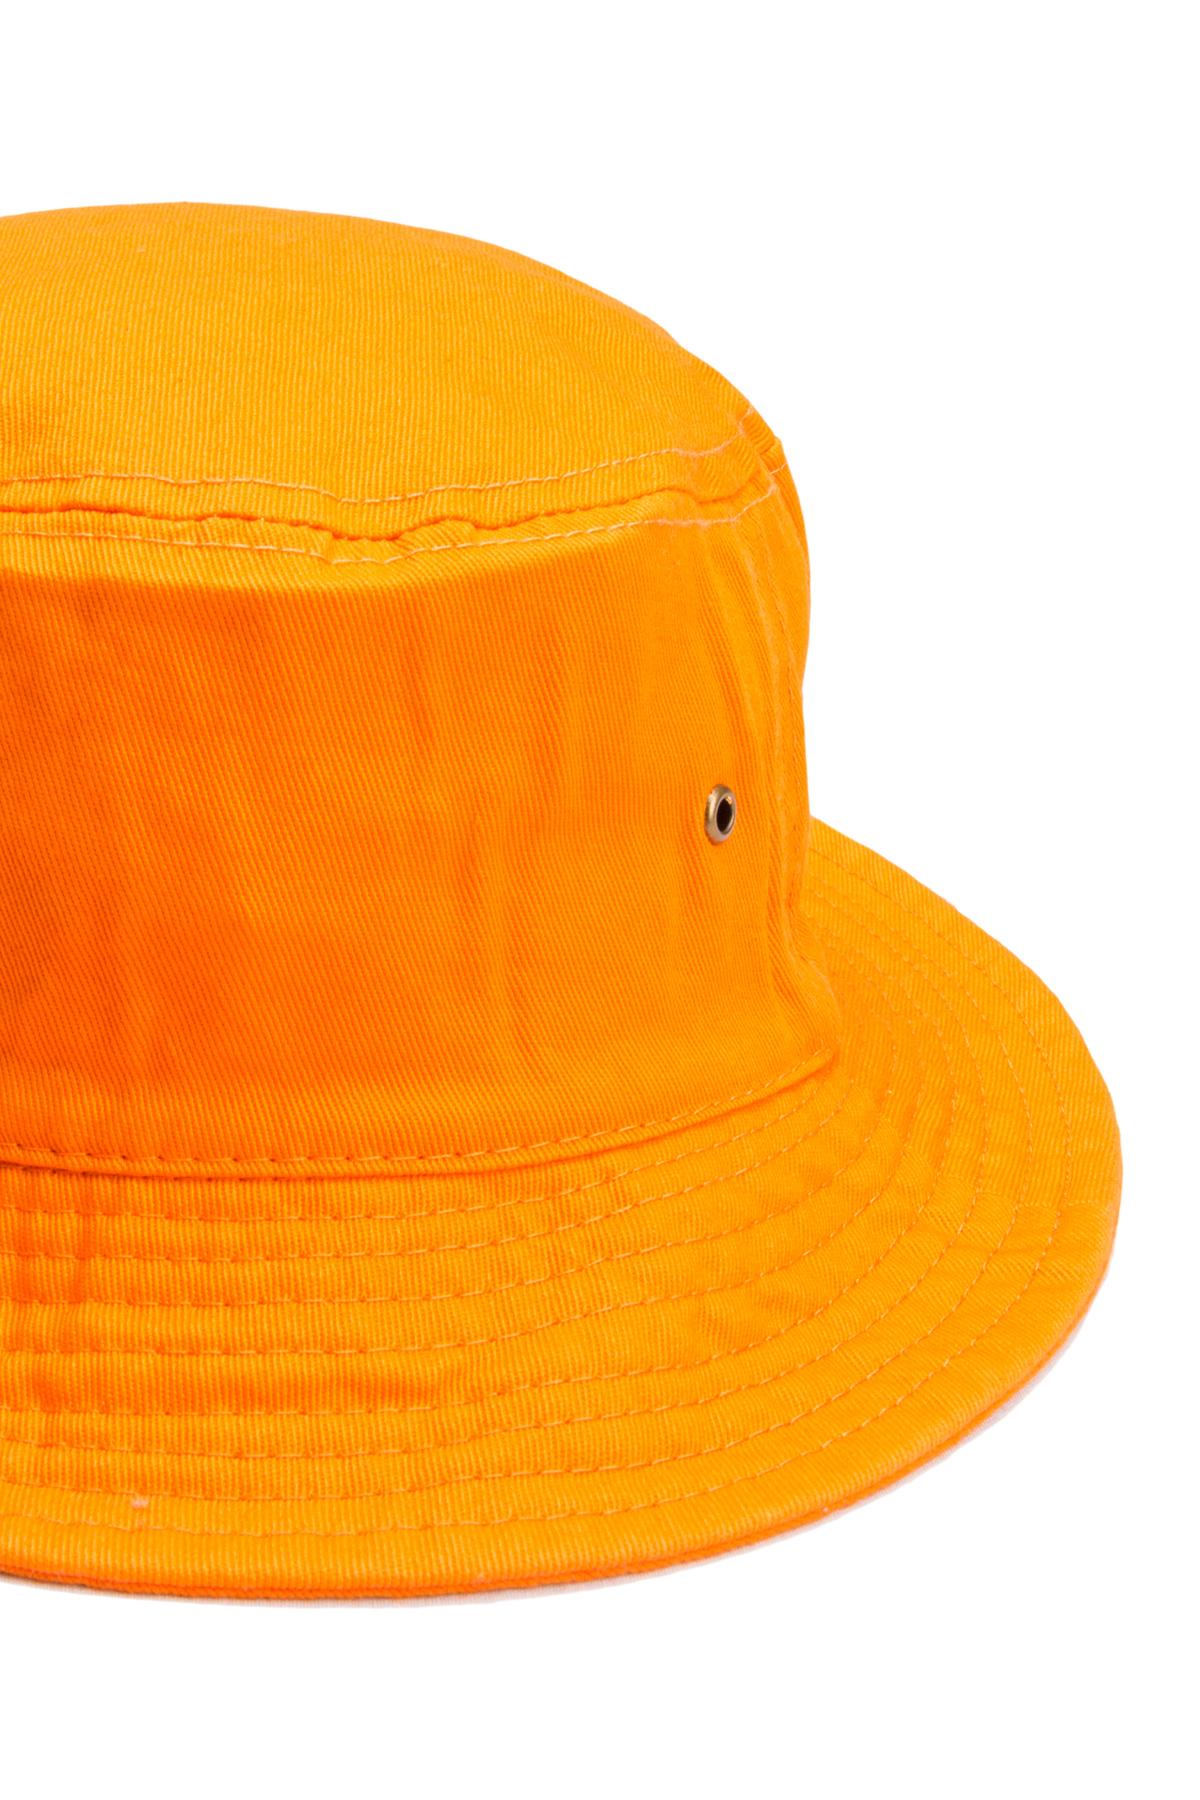 Orange Bucket Hat.